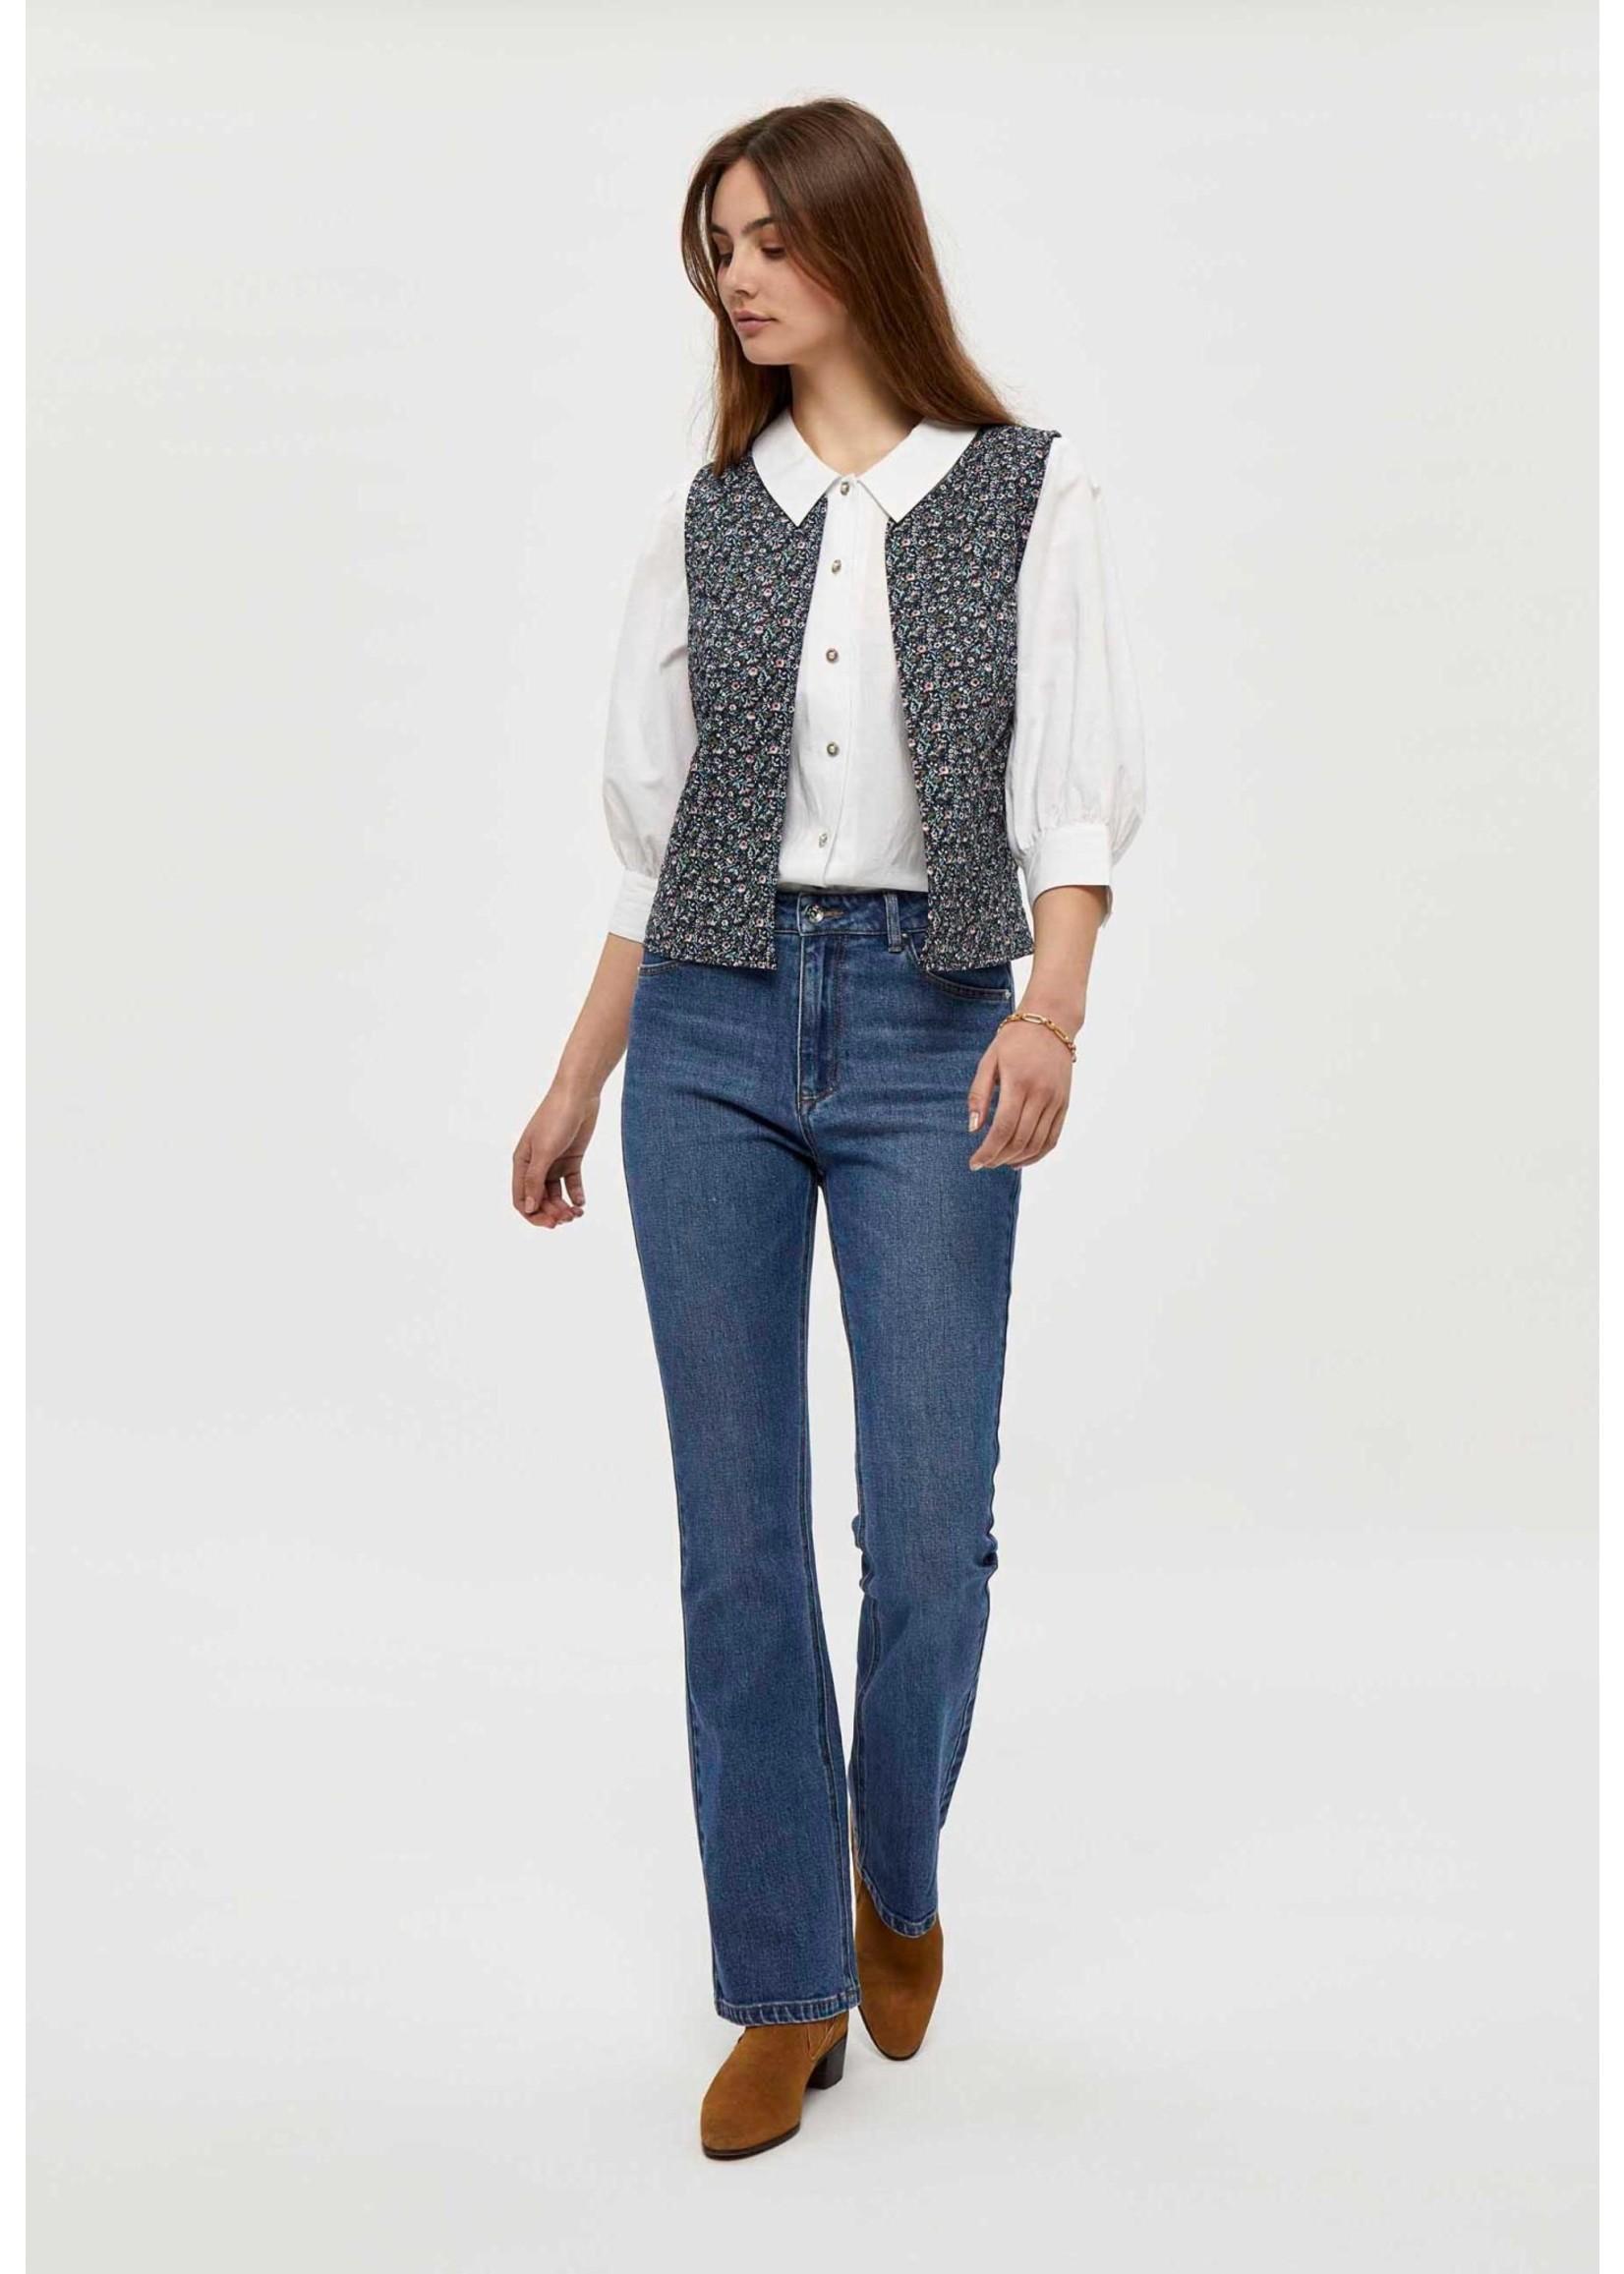 PEPPERCORN Luz Shirt White